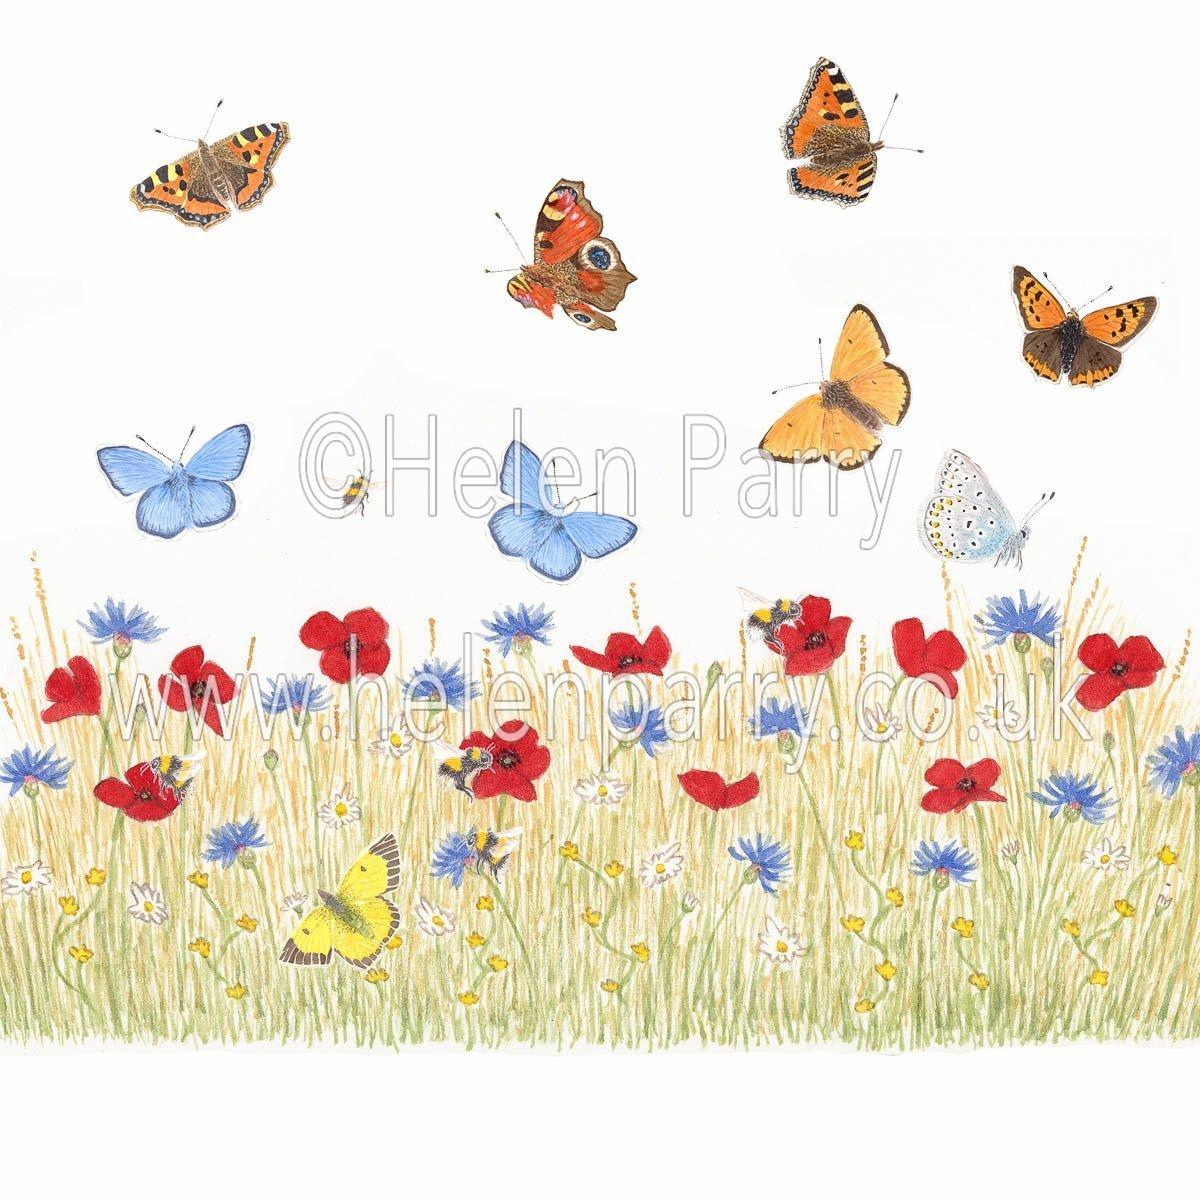 greeting card summer meadow wild flower cornflowers poppies butterflies